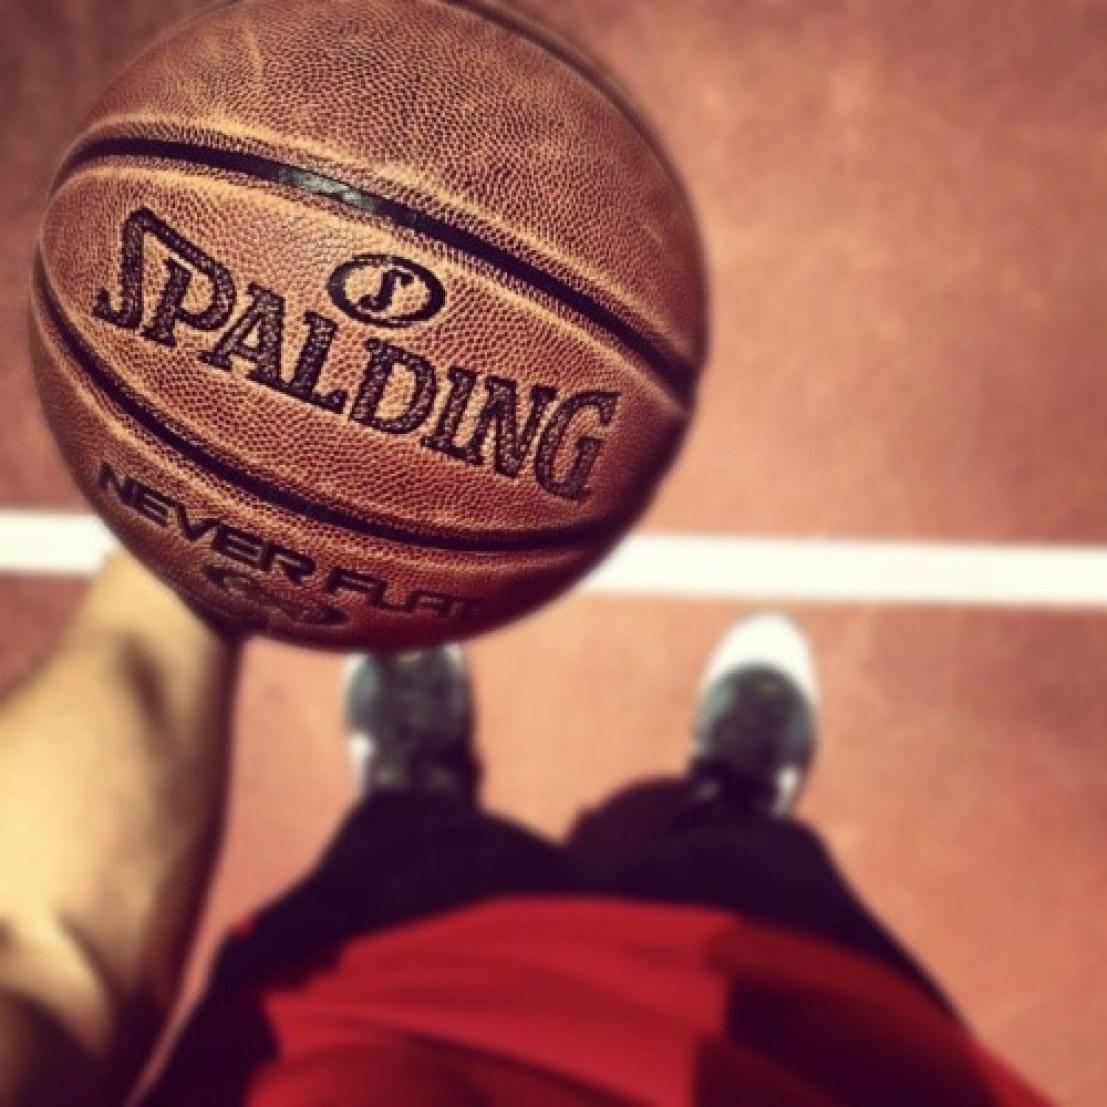 ISU bucket list - go to a basketball game!